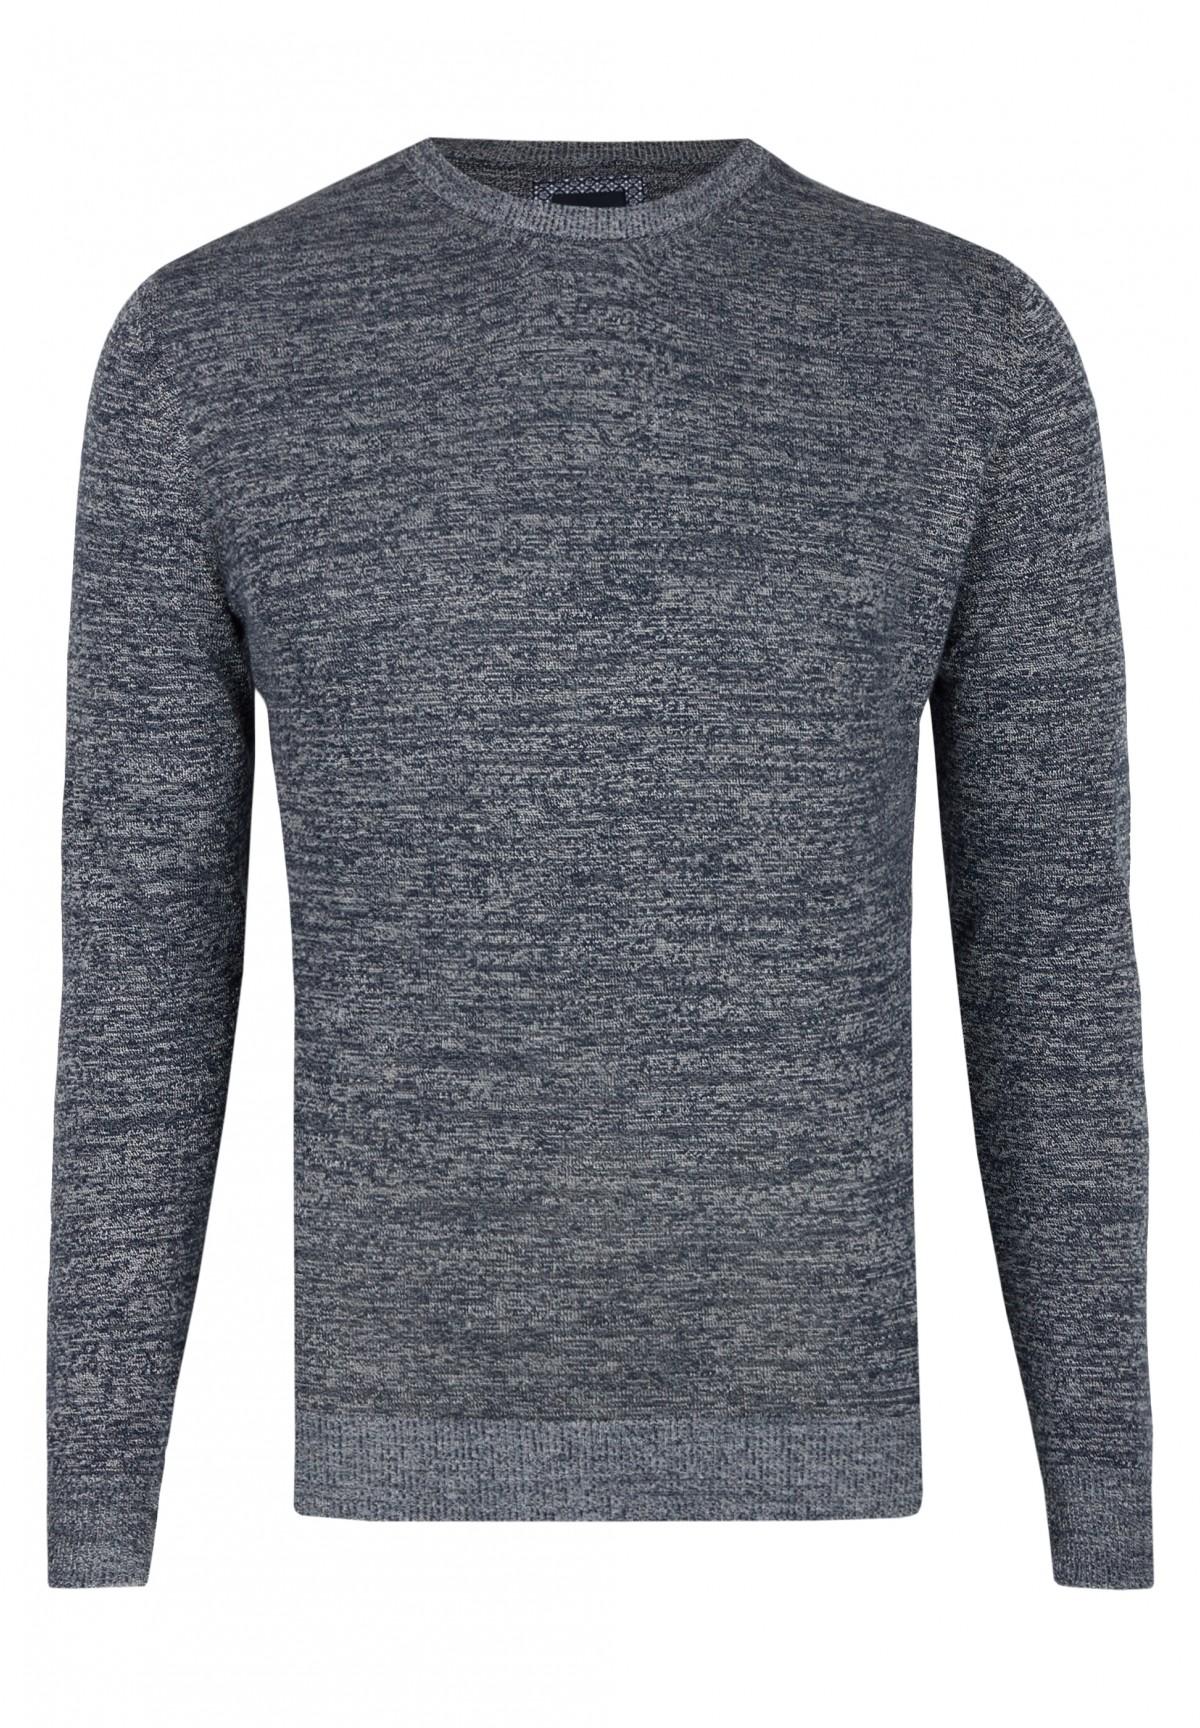 "Pullover ""Silk Touch"" / CREW NECK"